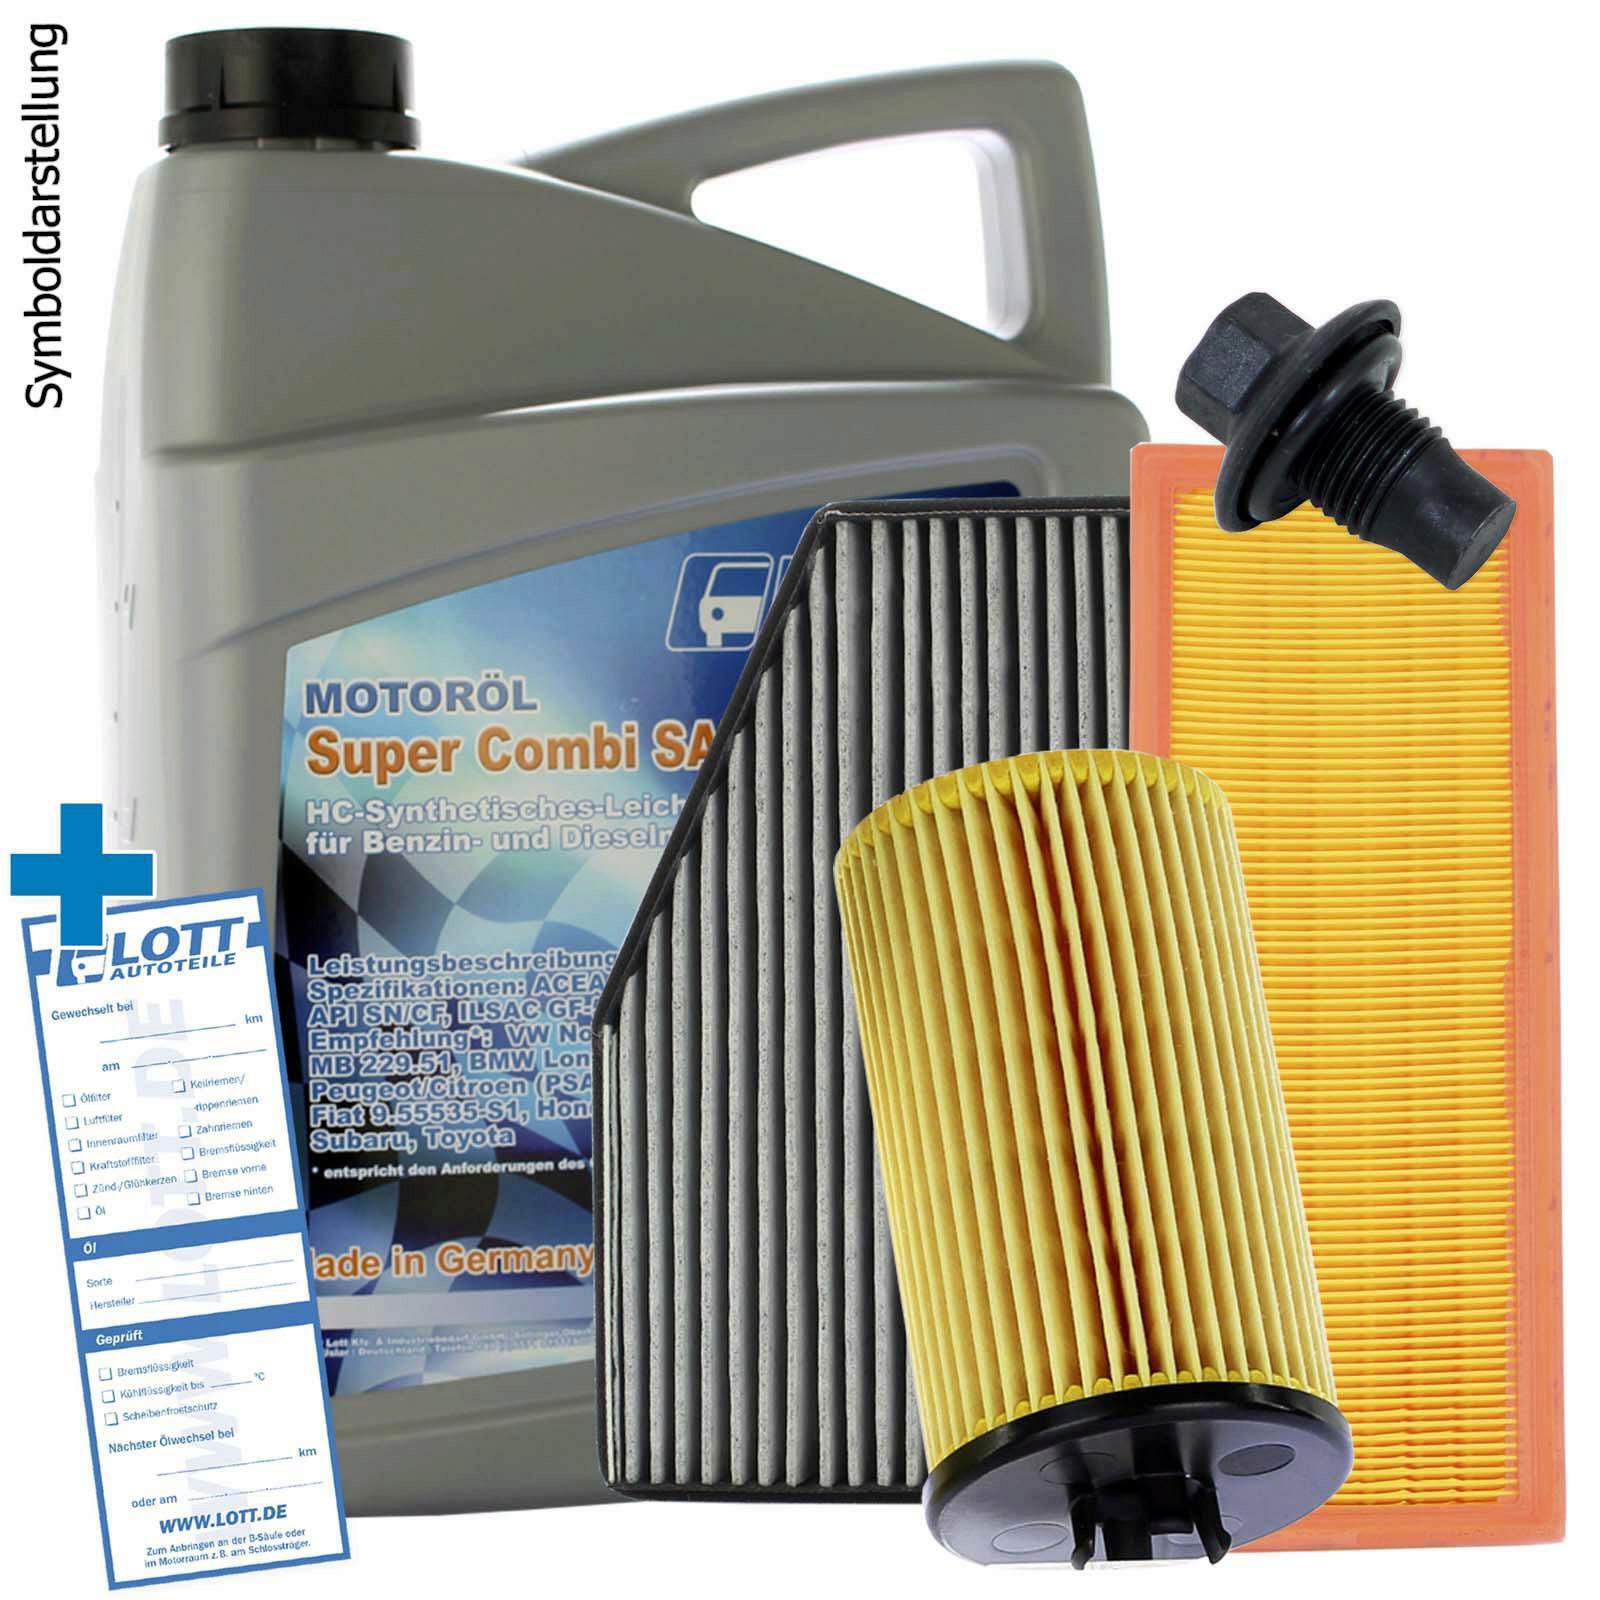 Lott Motoröl + Ölfilter + Luftfilter + Innenraumfilter + Ablassschraube